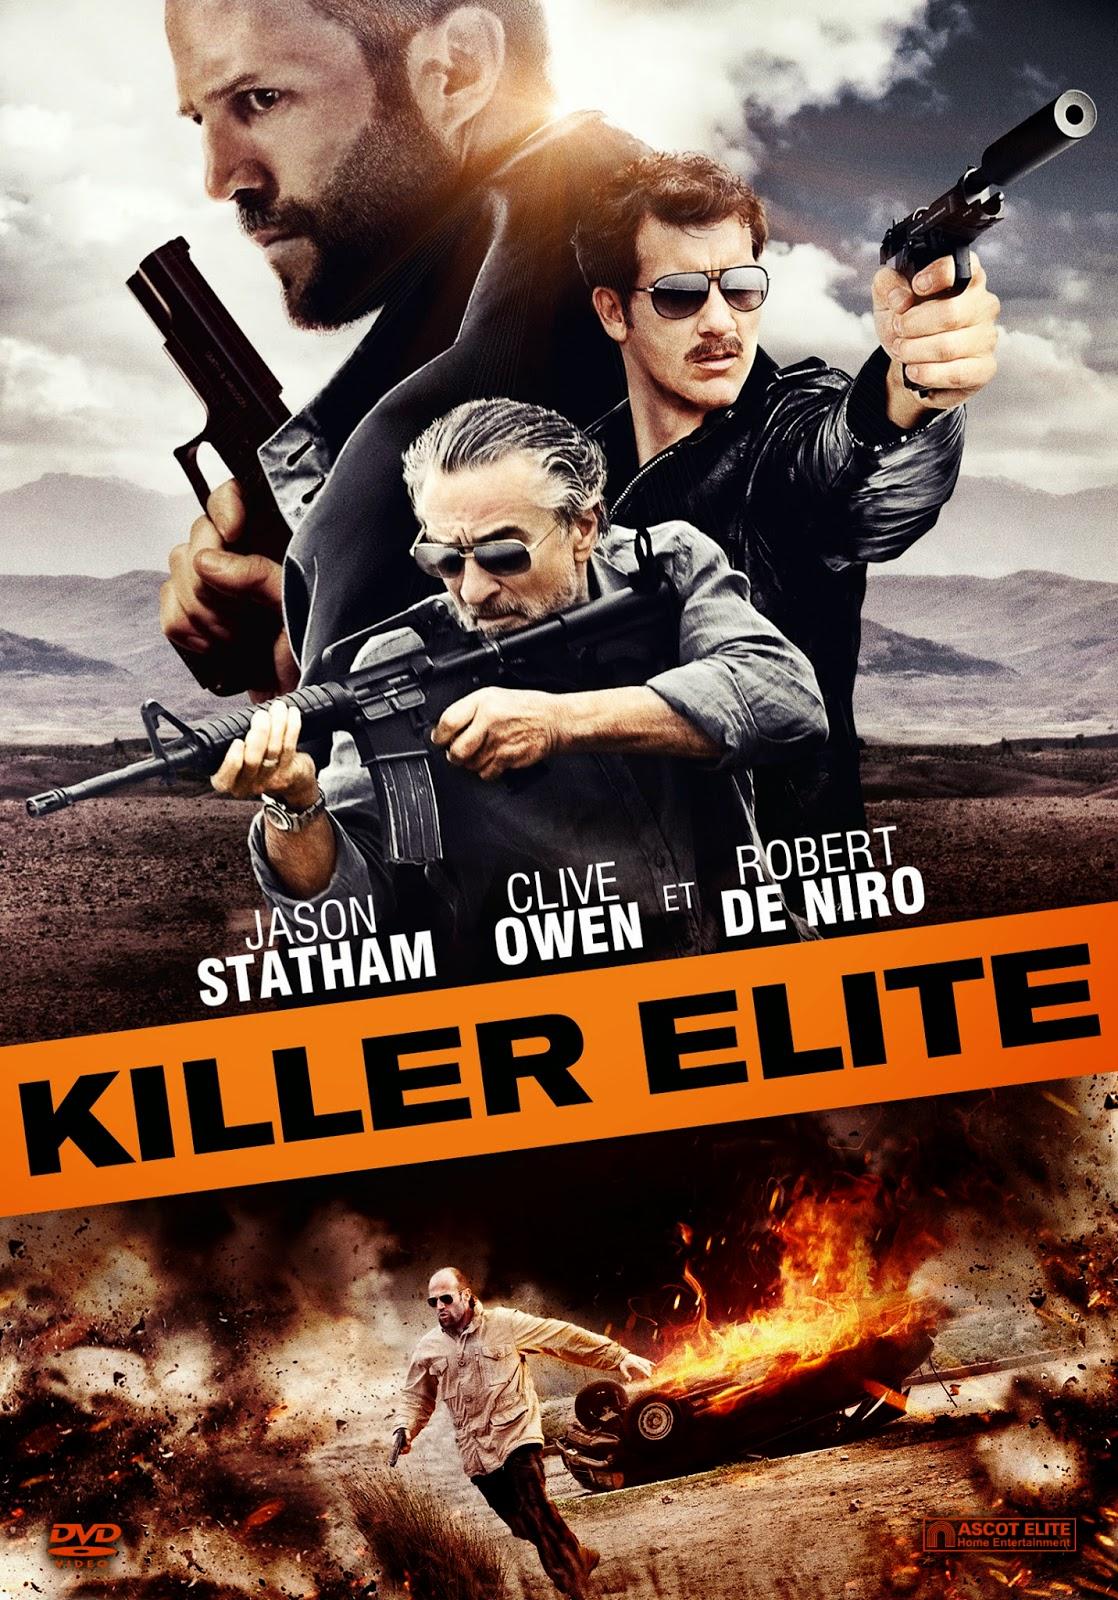 Killer Elite สามโหด โคตรพันธุ์ดุ [HD][พากย์ไทย]